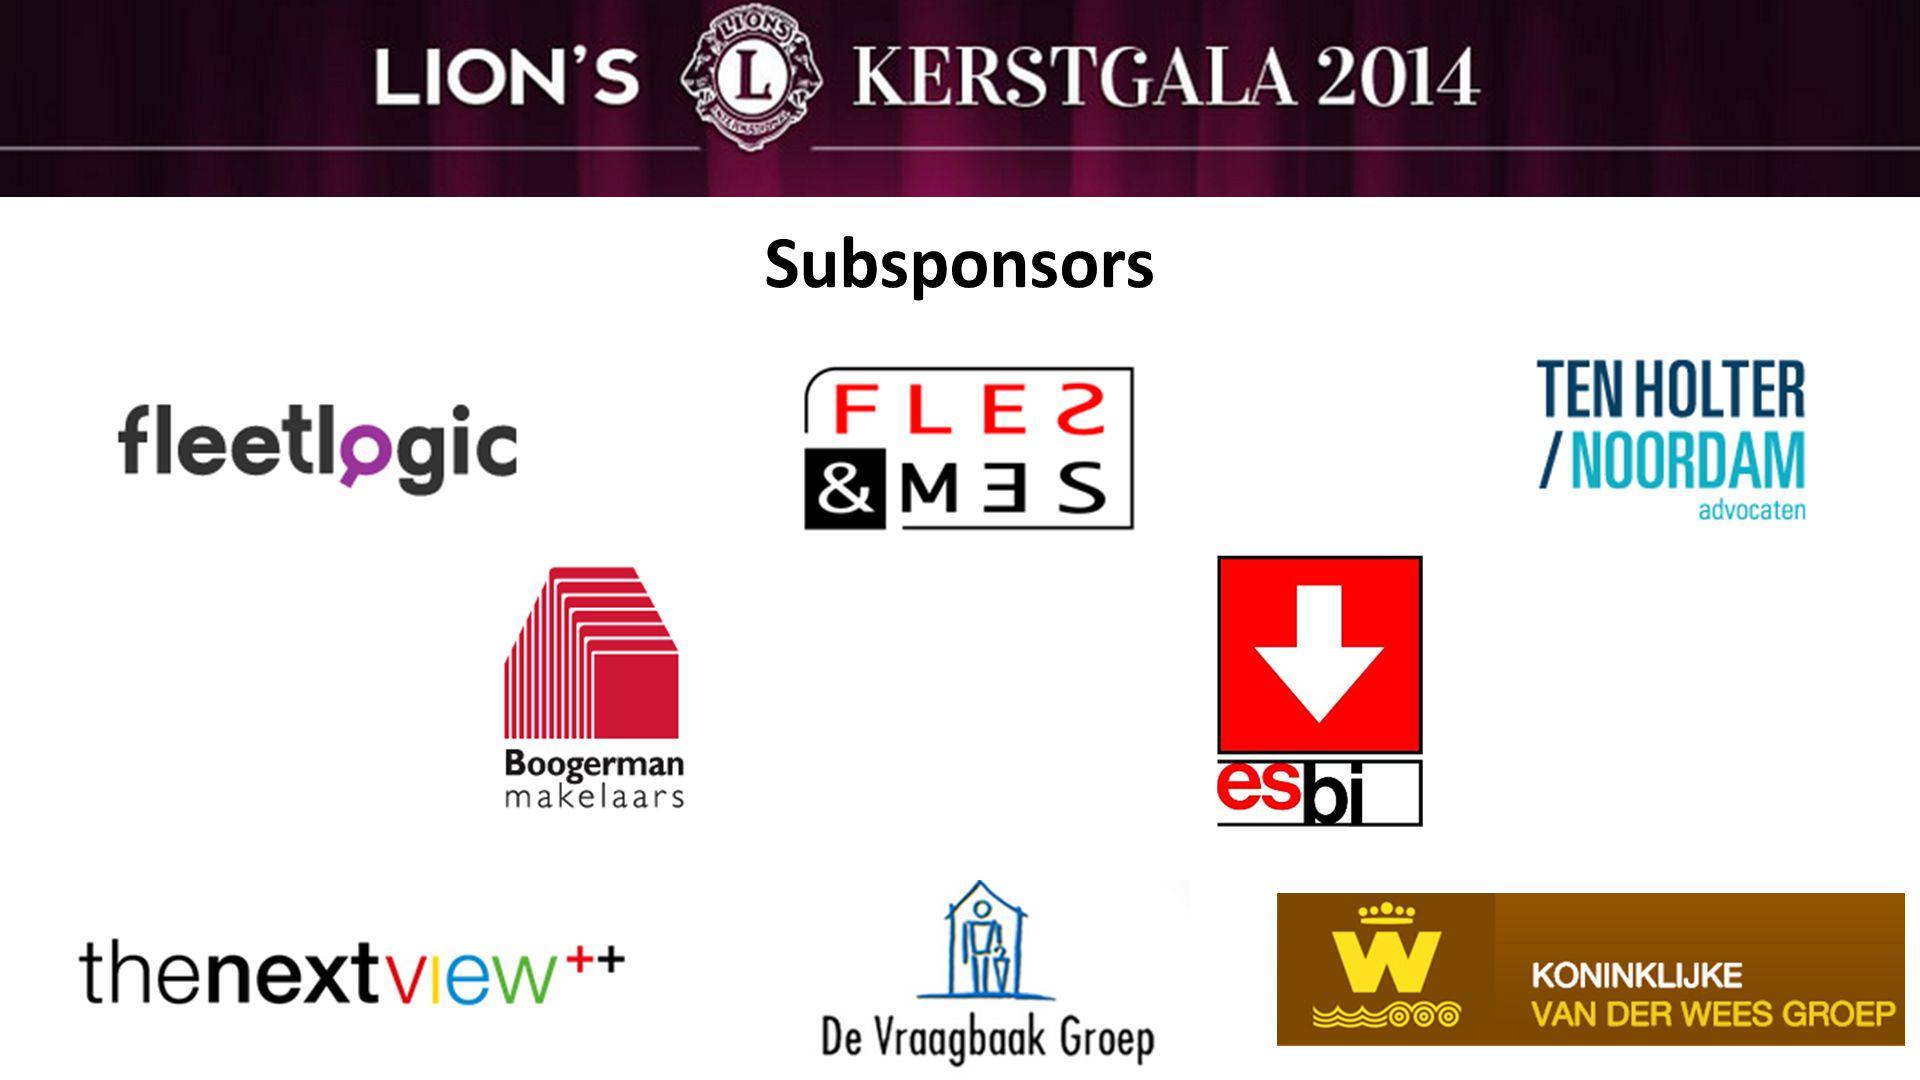 Subsponsors